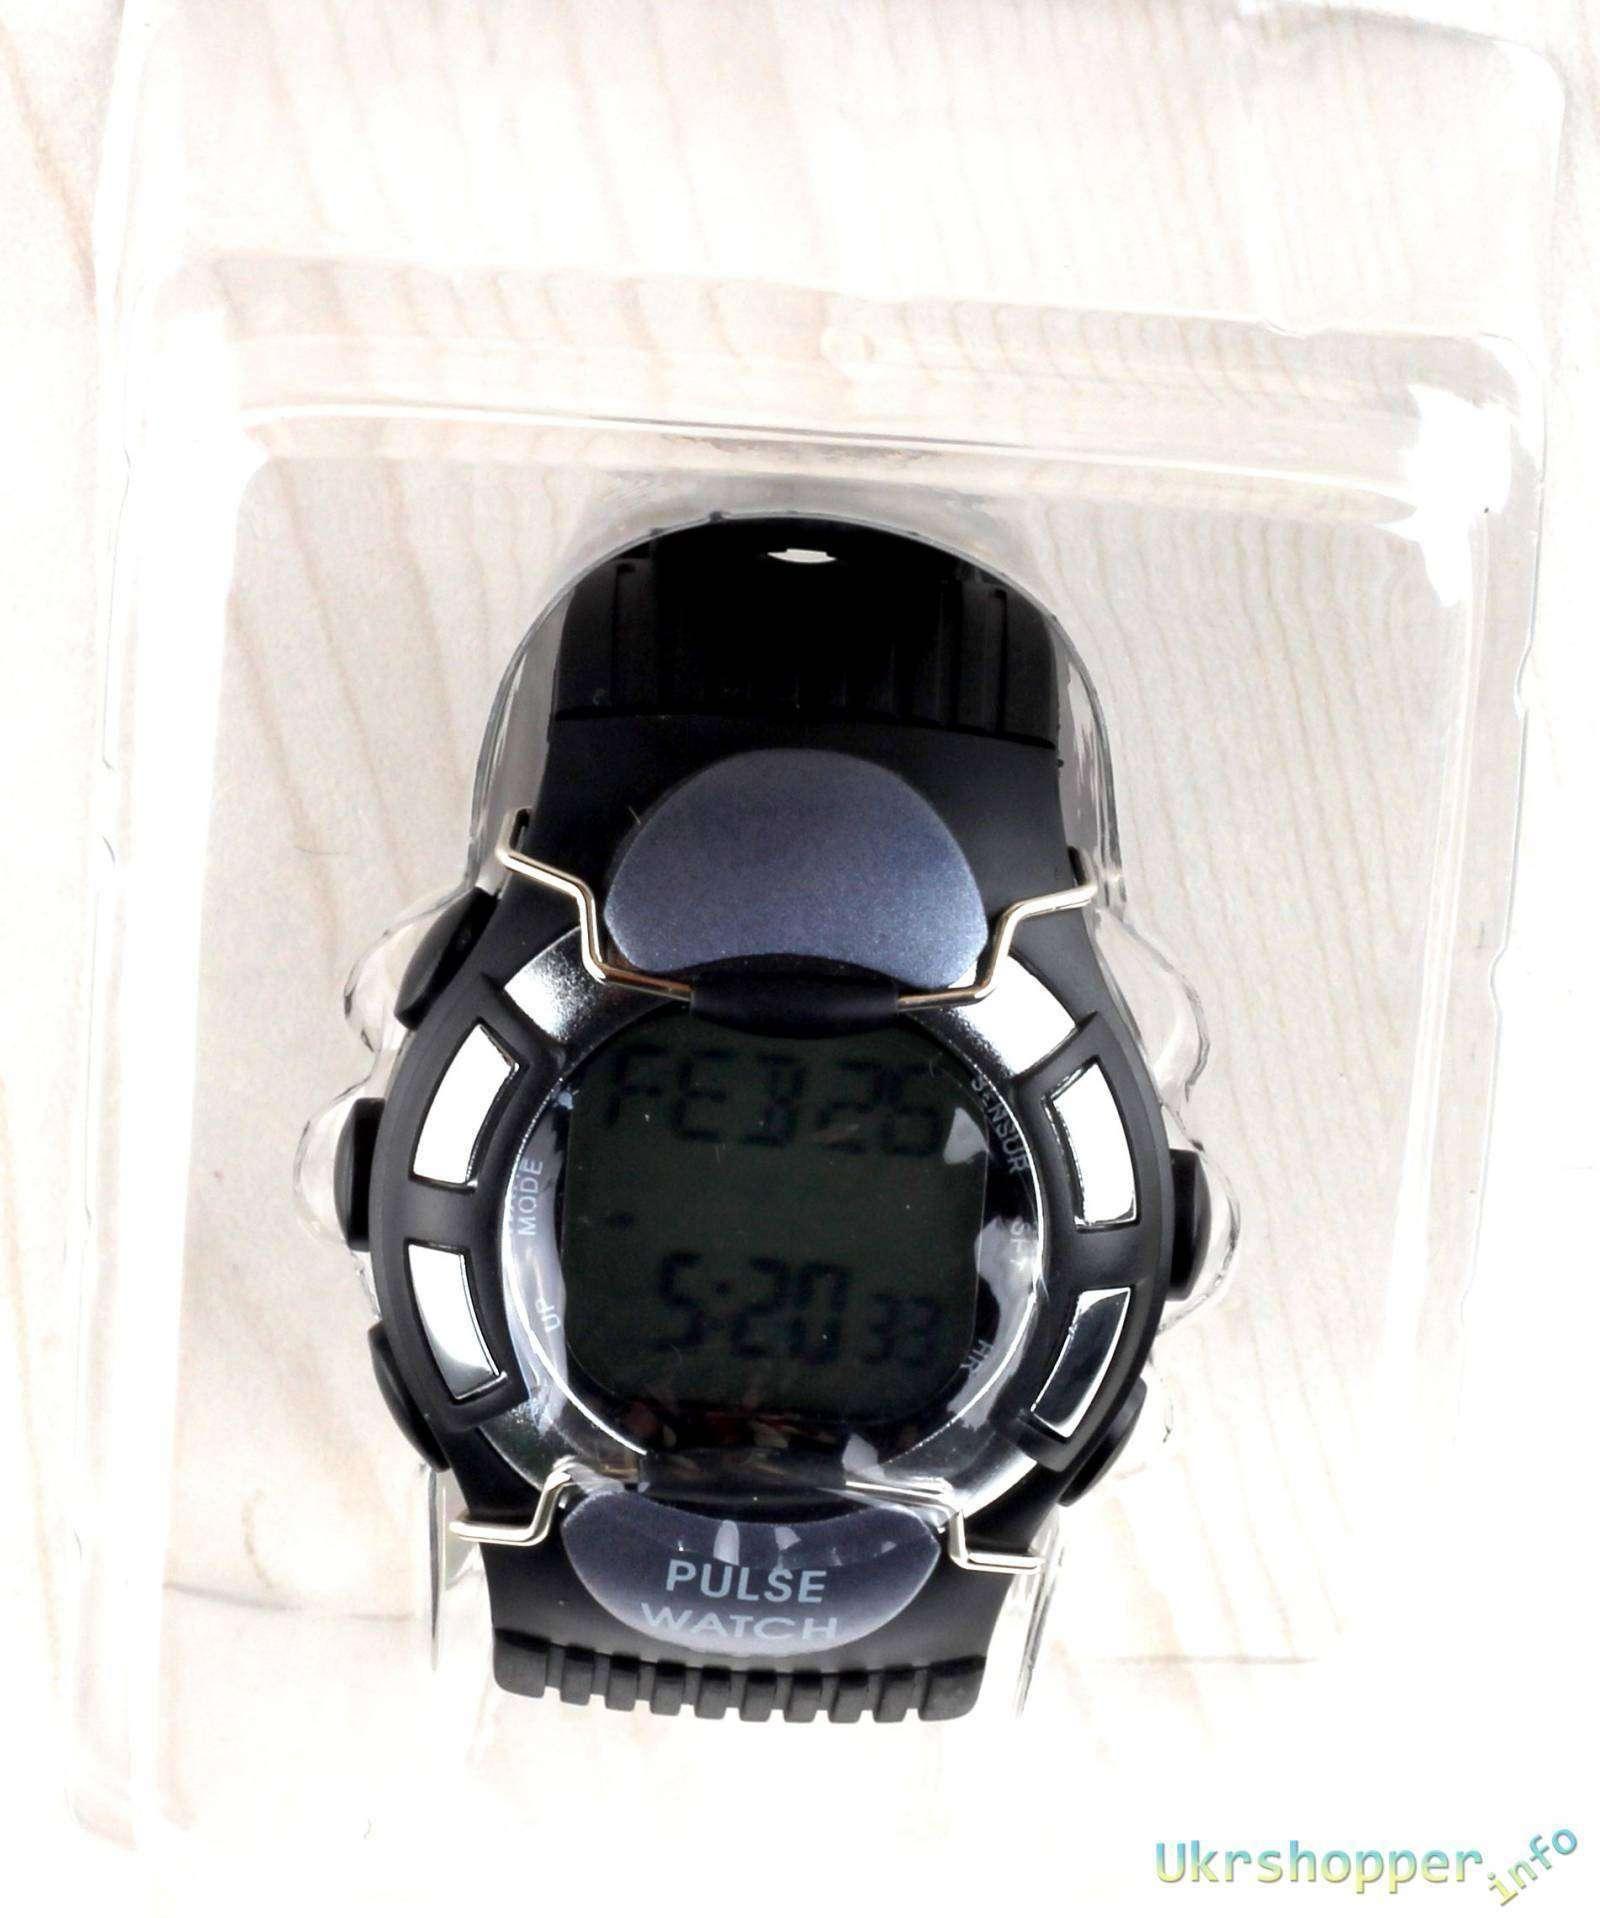 Aliexpress: Обзор электронных часов KYTO с пульсомером, шагомером, счетчиком калорий.